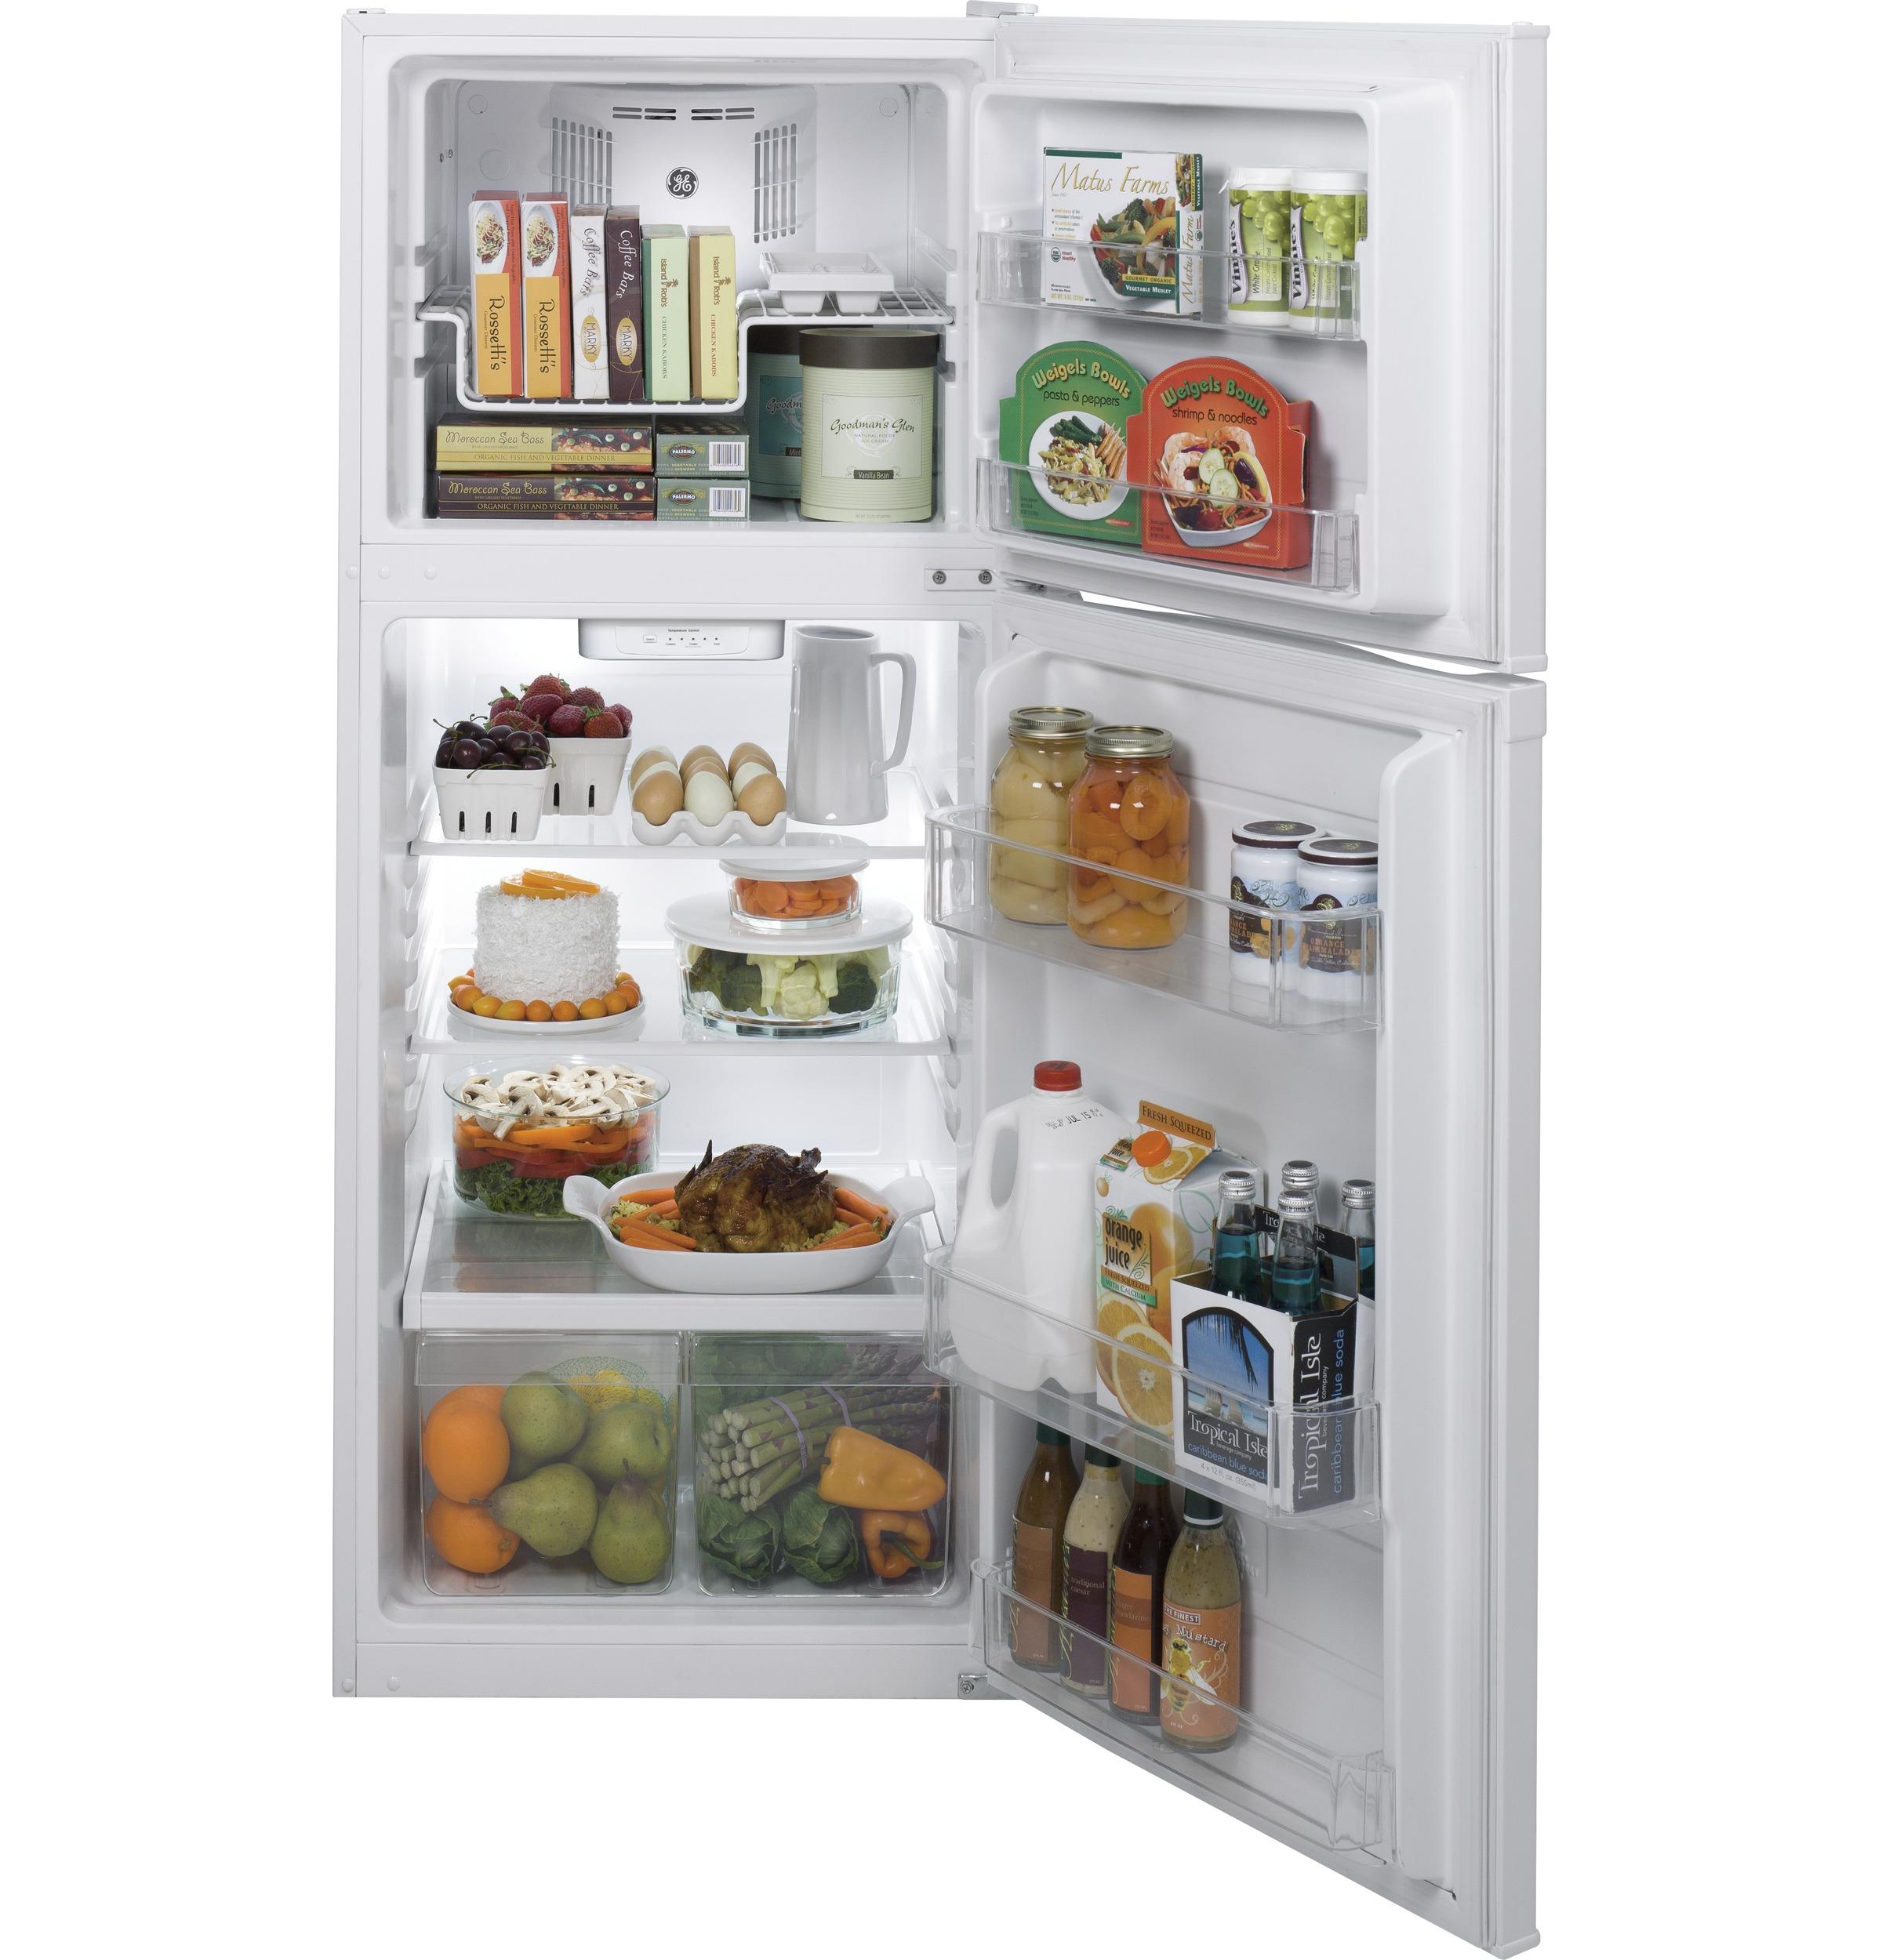 Model: GPE12FGKWW | GE GE® ENERGY STAR® 11.6 cu. ft. Top-Freezer Refrigerator